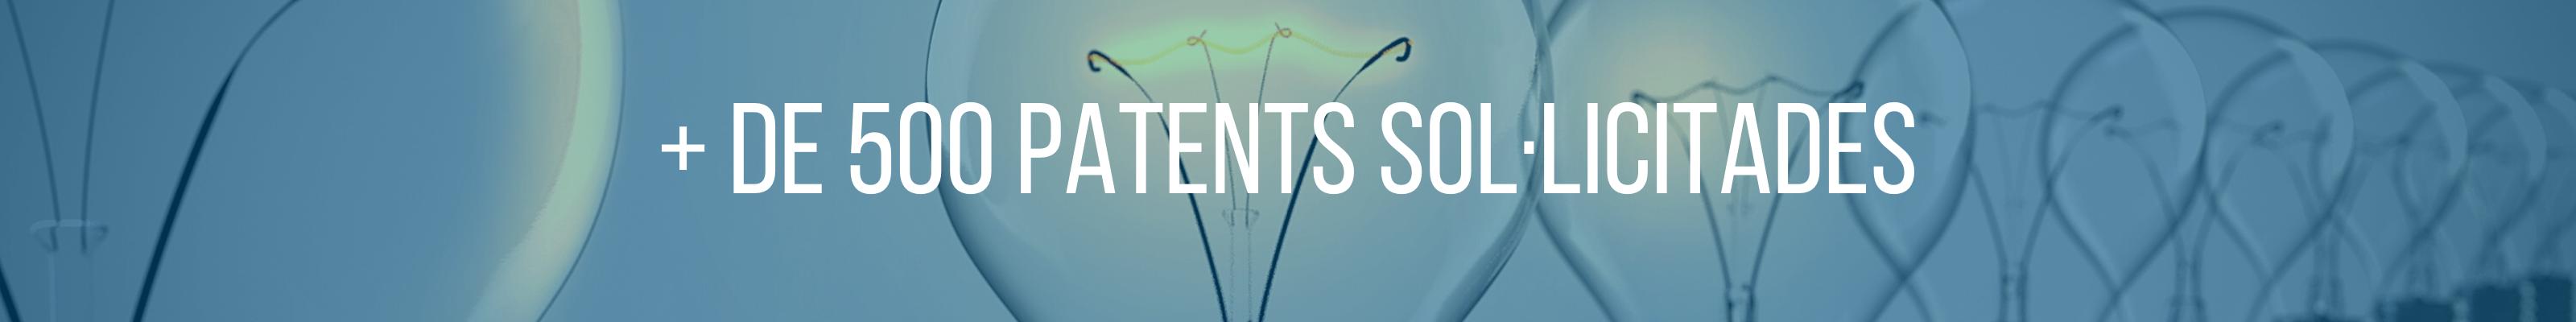 innovacio-patents.png